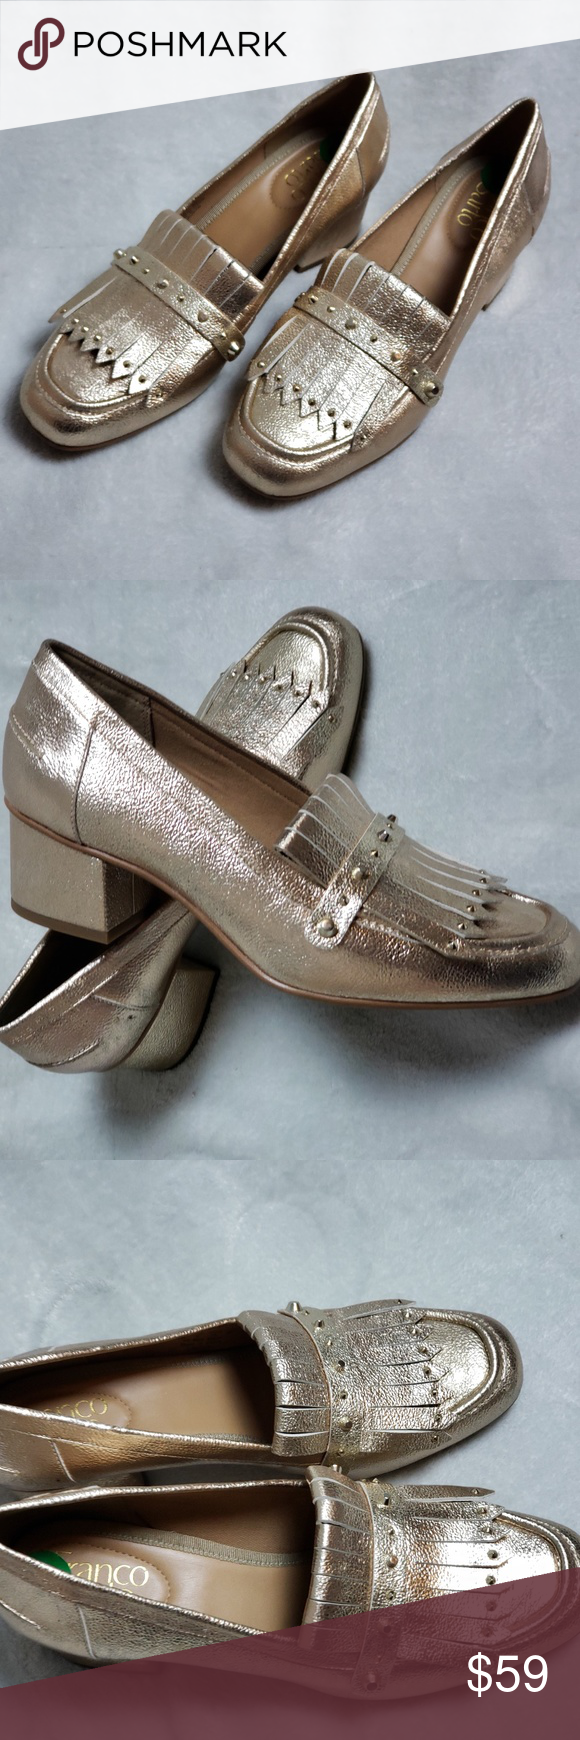 4cfed7f2893 Franco Sartoetallic Gold Fringe Block Heel Loafers Franco Sarto  Lauryn   gold metallic heeled loafers